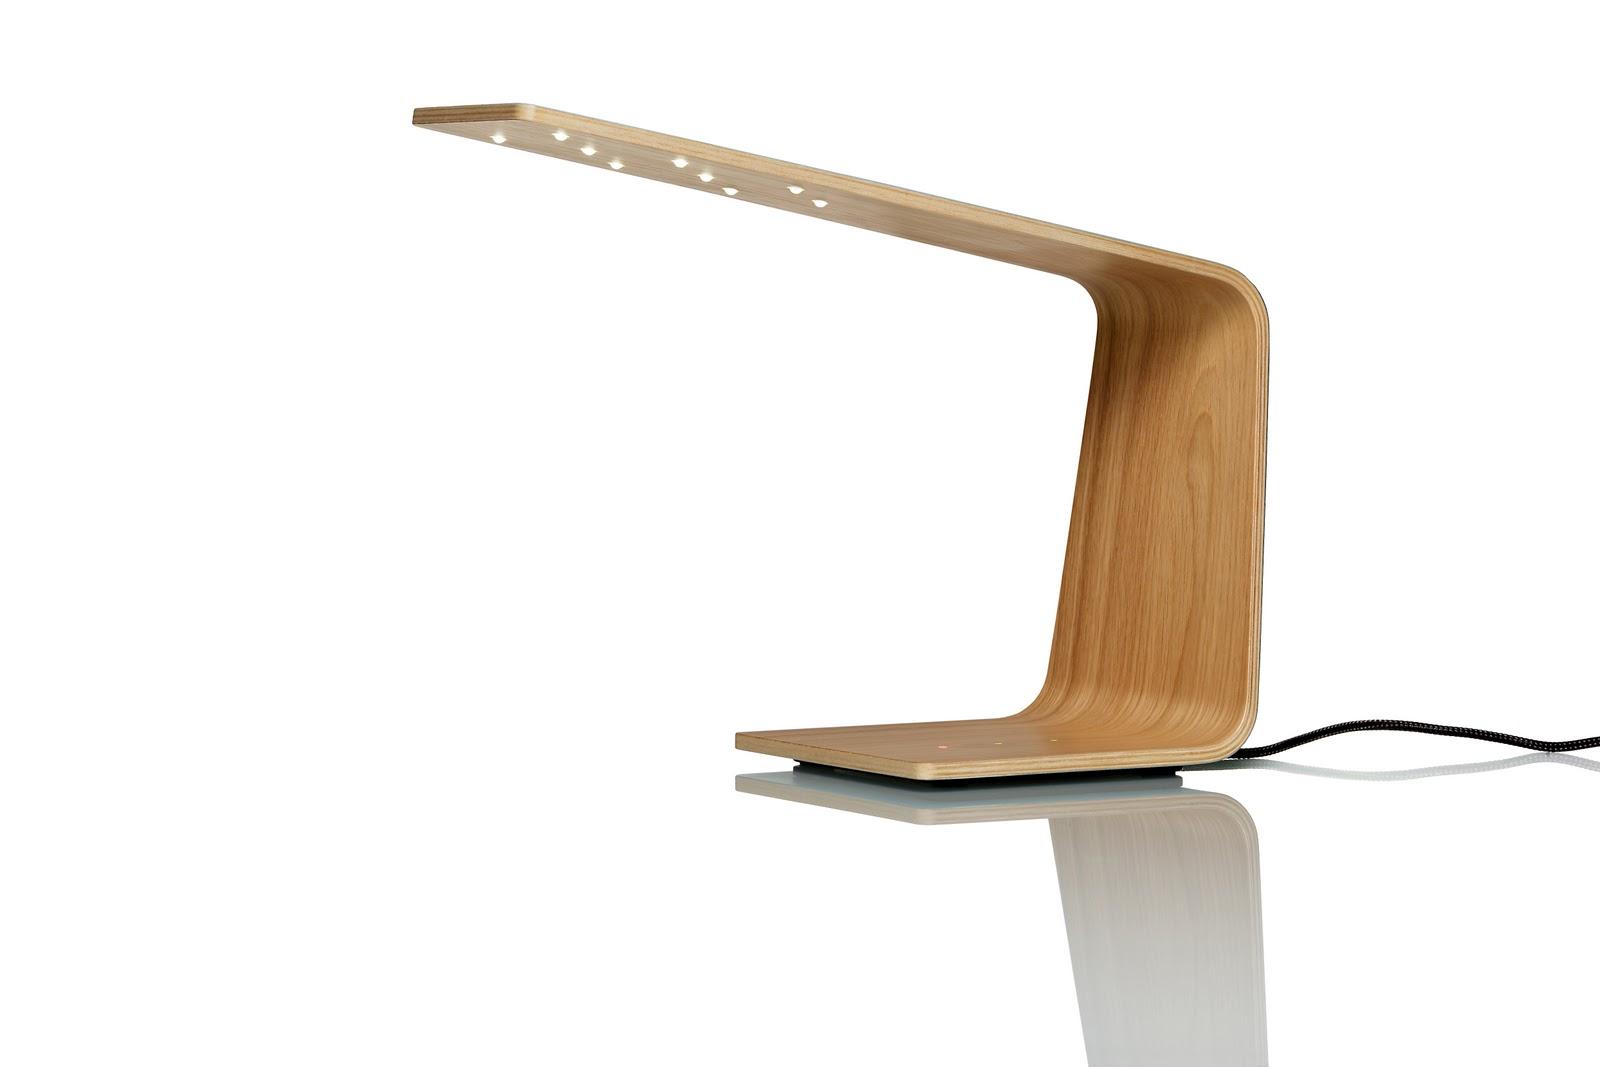 Touch Sensitive Lamp Simple Modern Design Ledo Lamps Picture On Tunto Led  Series Fine Slim Designed Nice Ideas